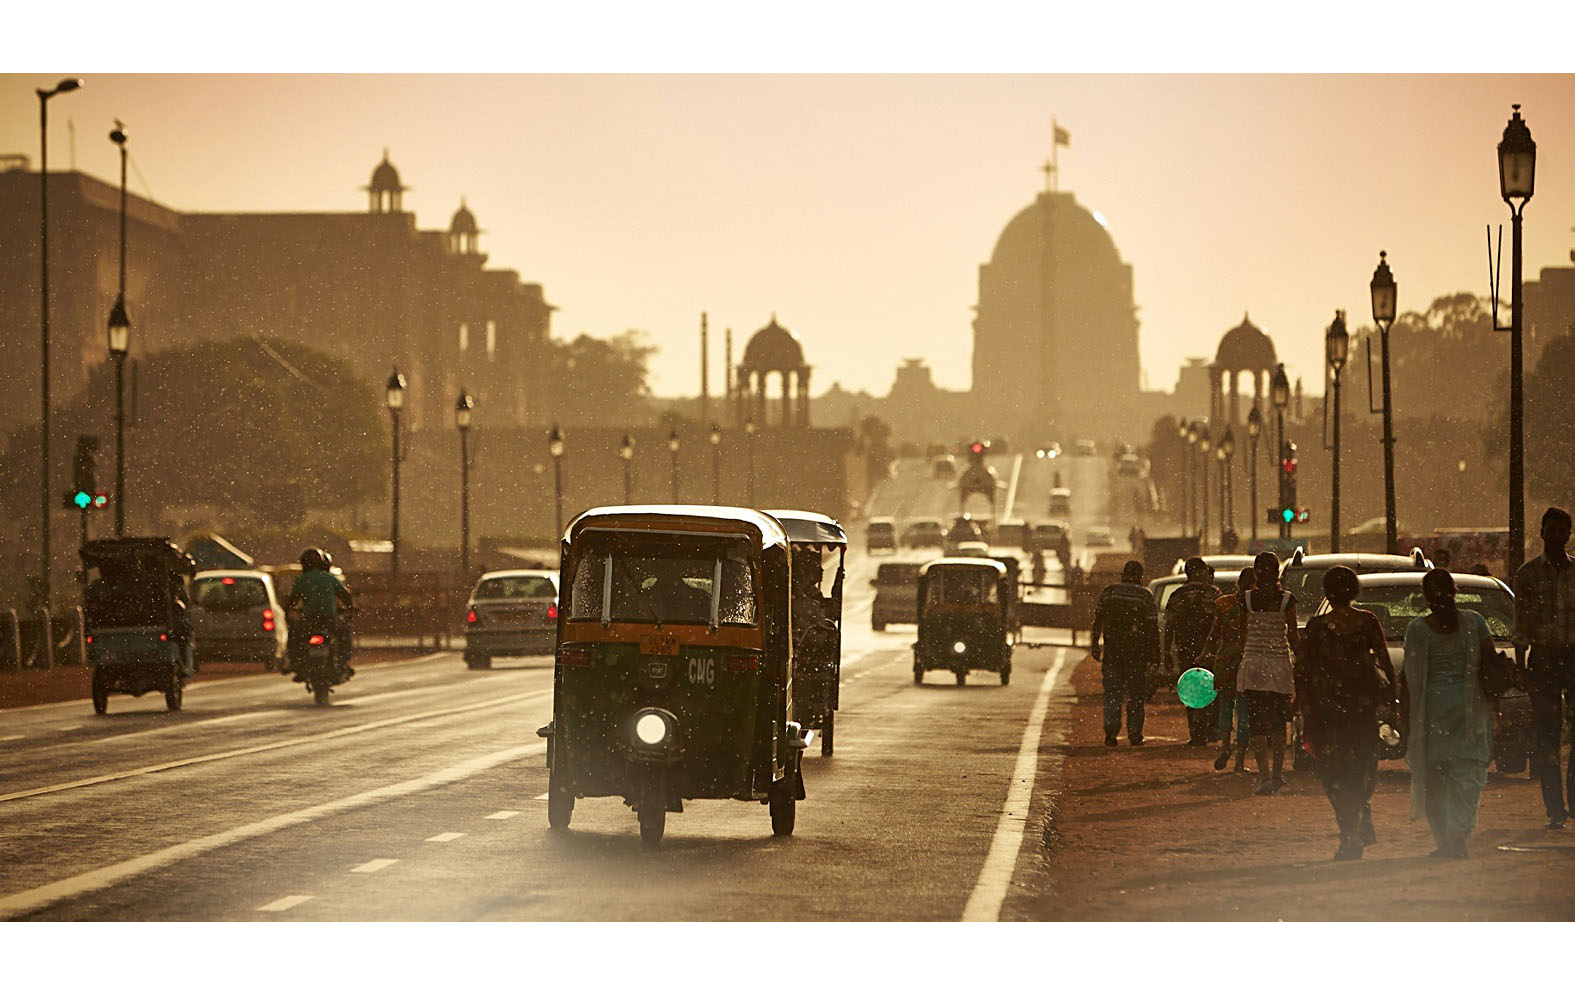 NEW DELHI - INDIA